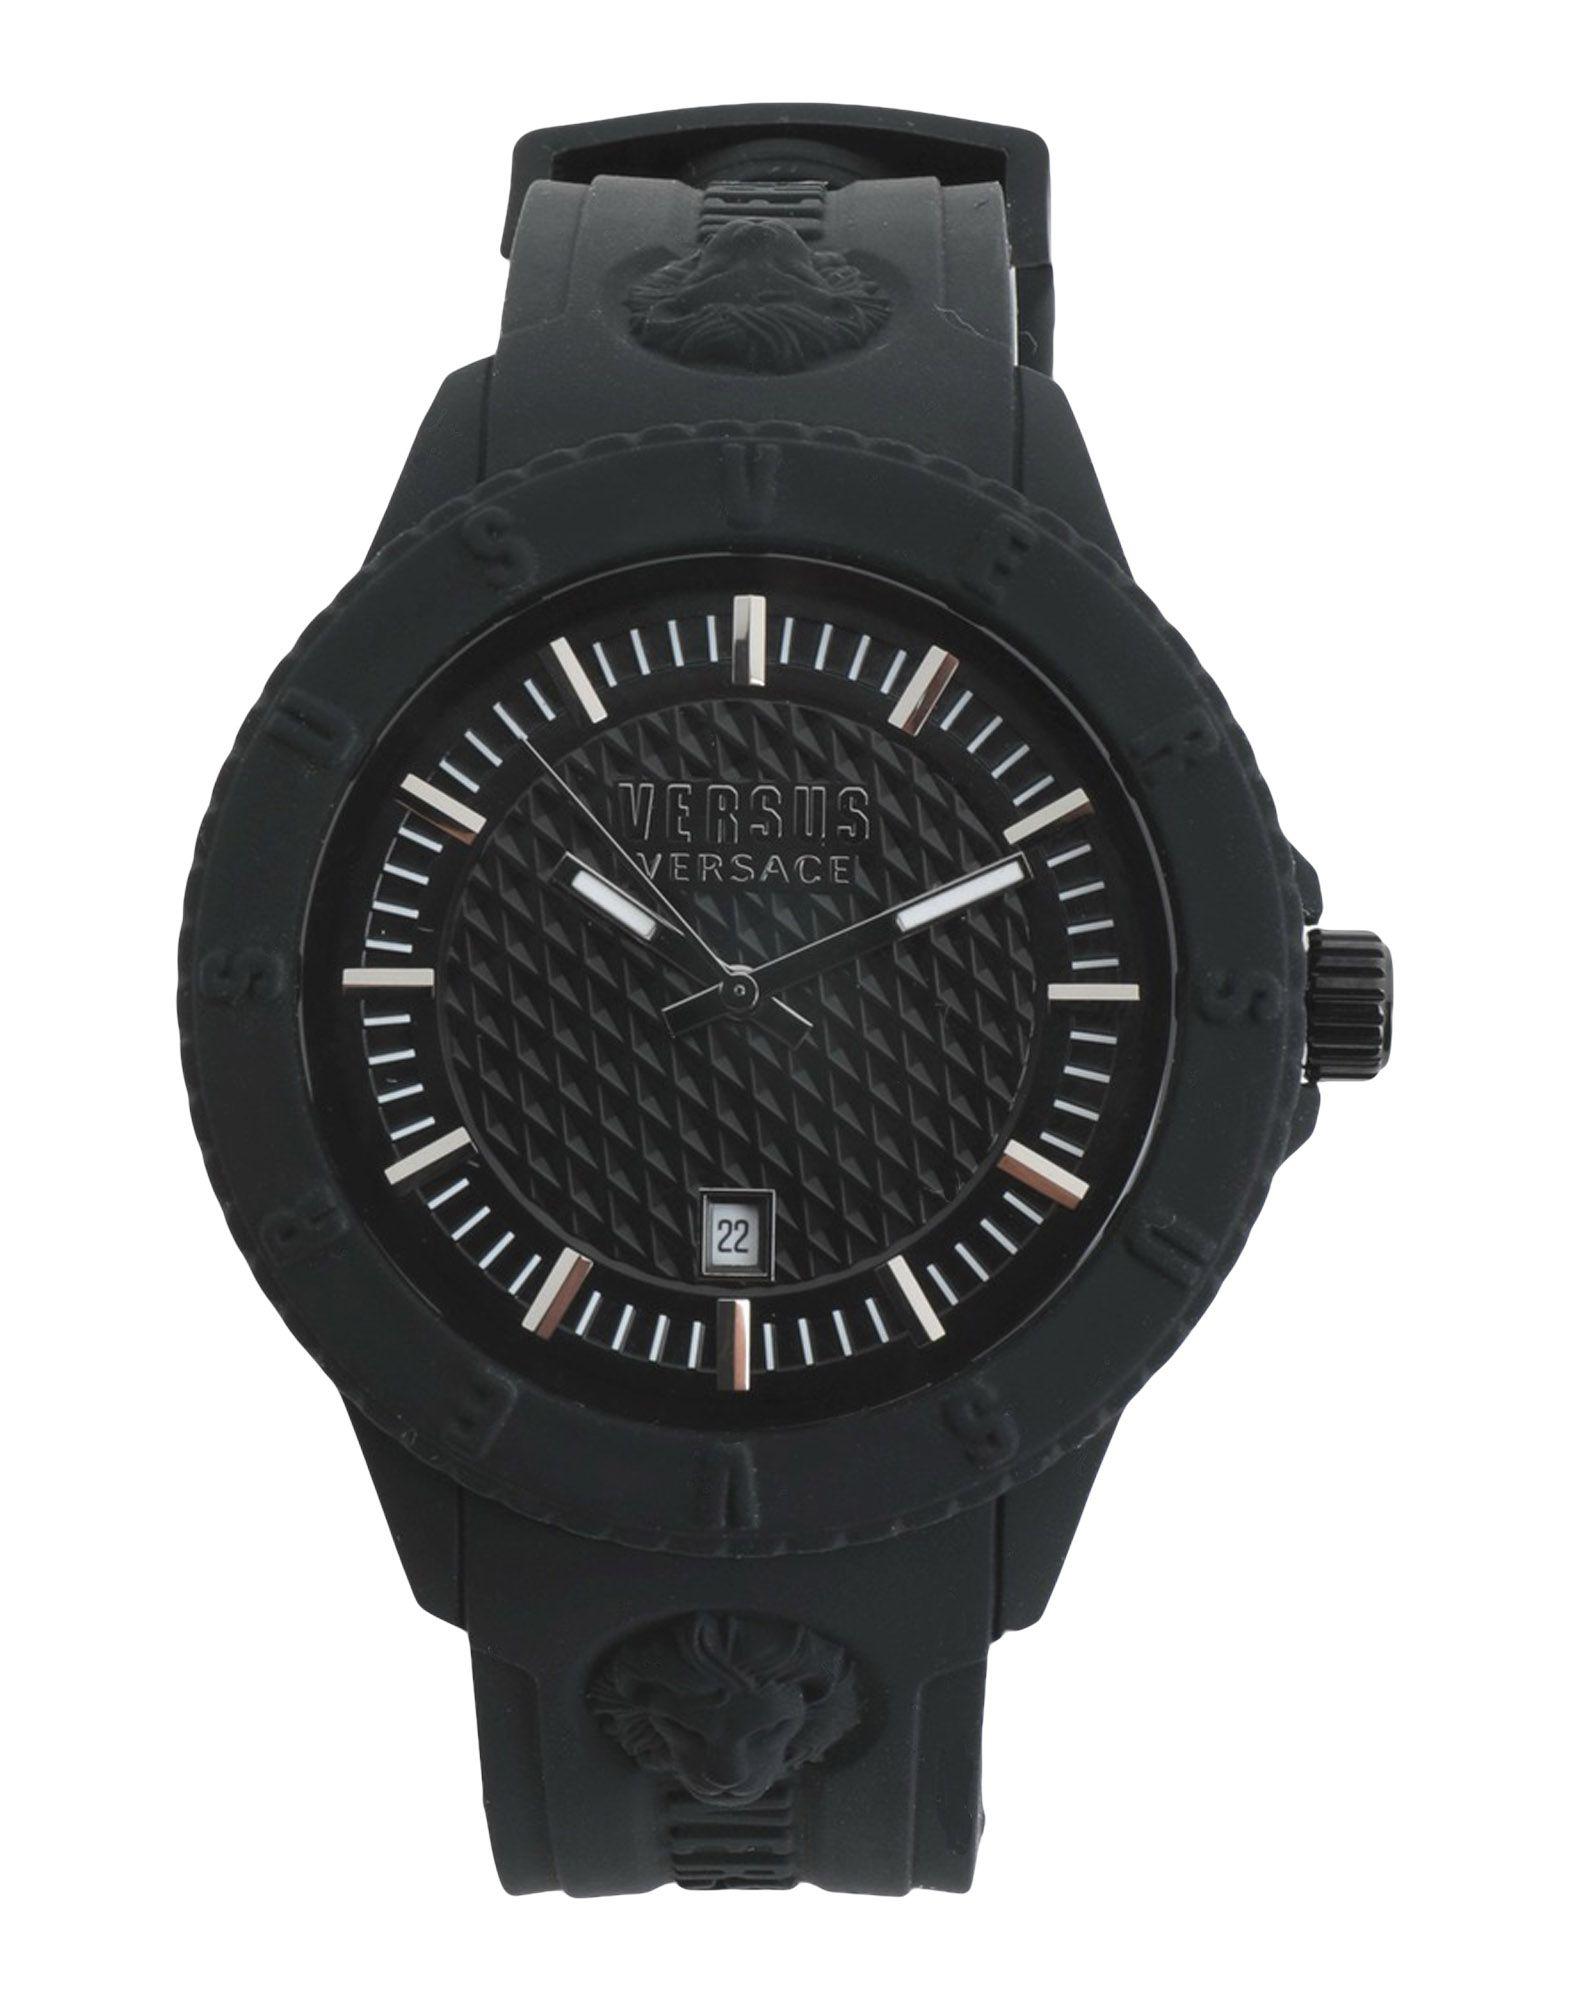 VERSUS VERSACE Наручные часы часы мужские versace